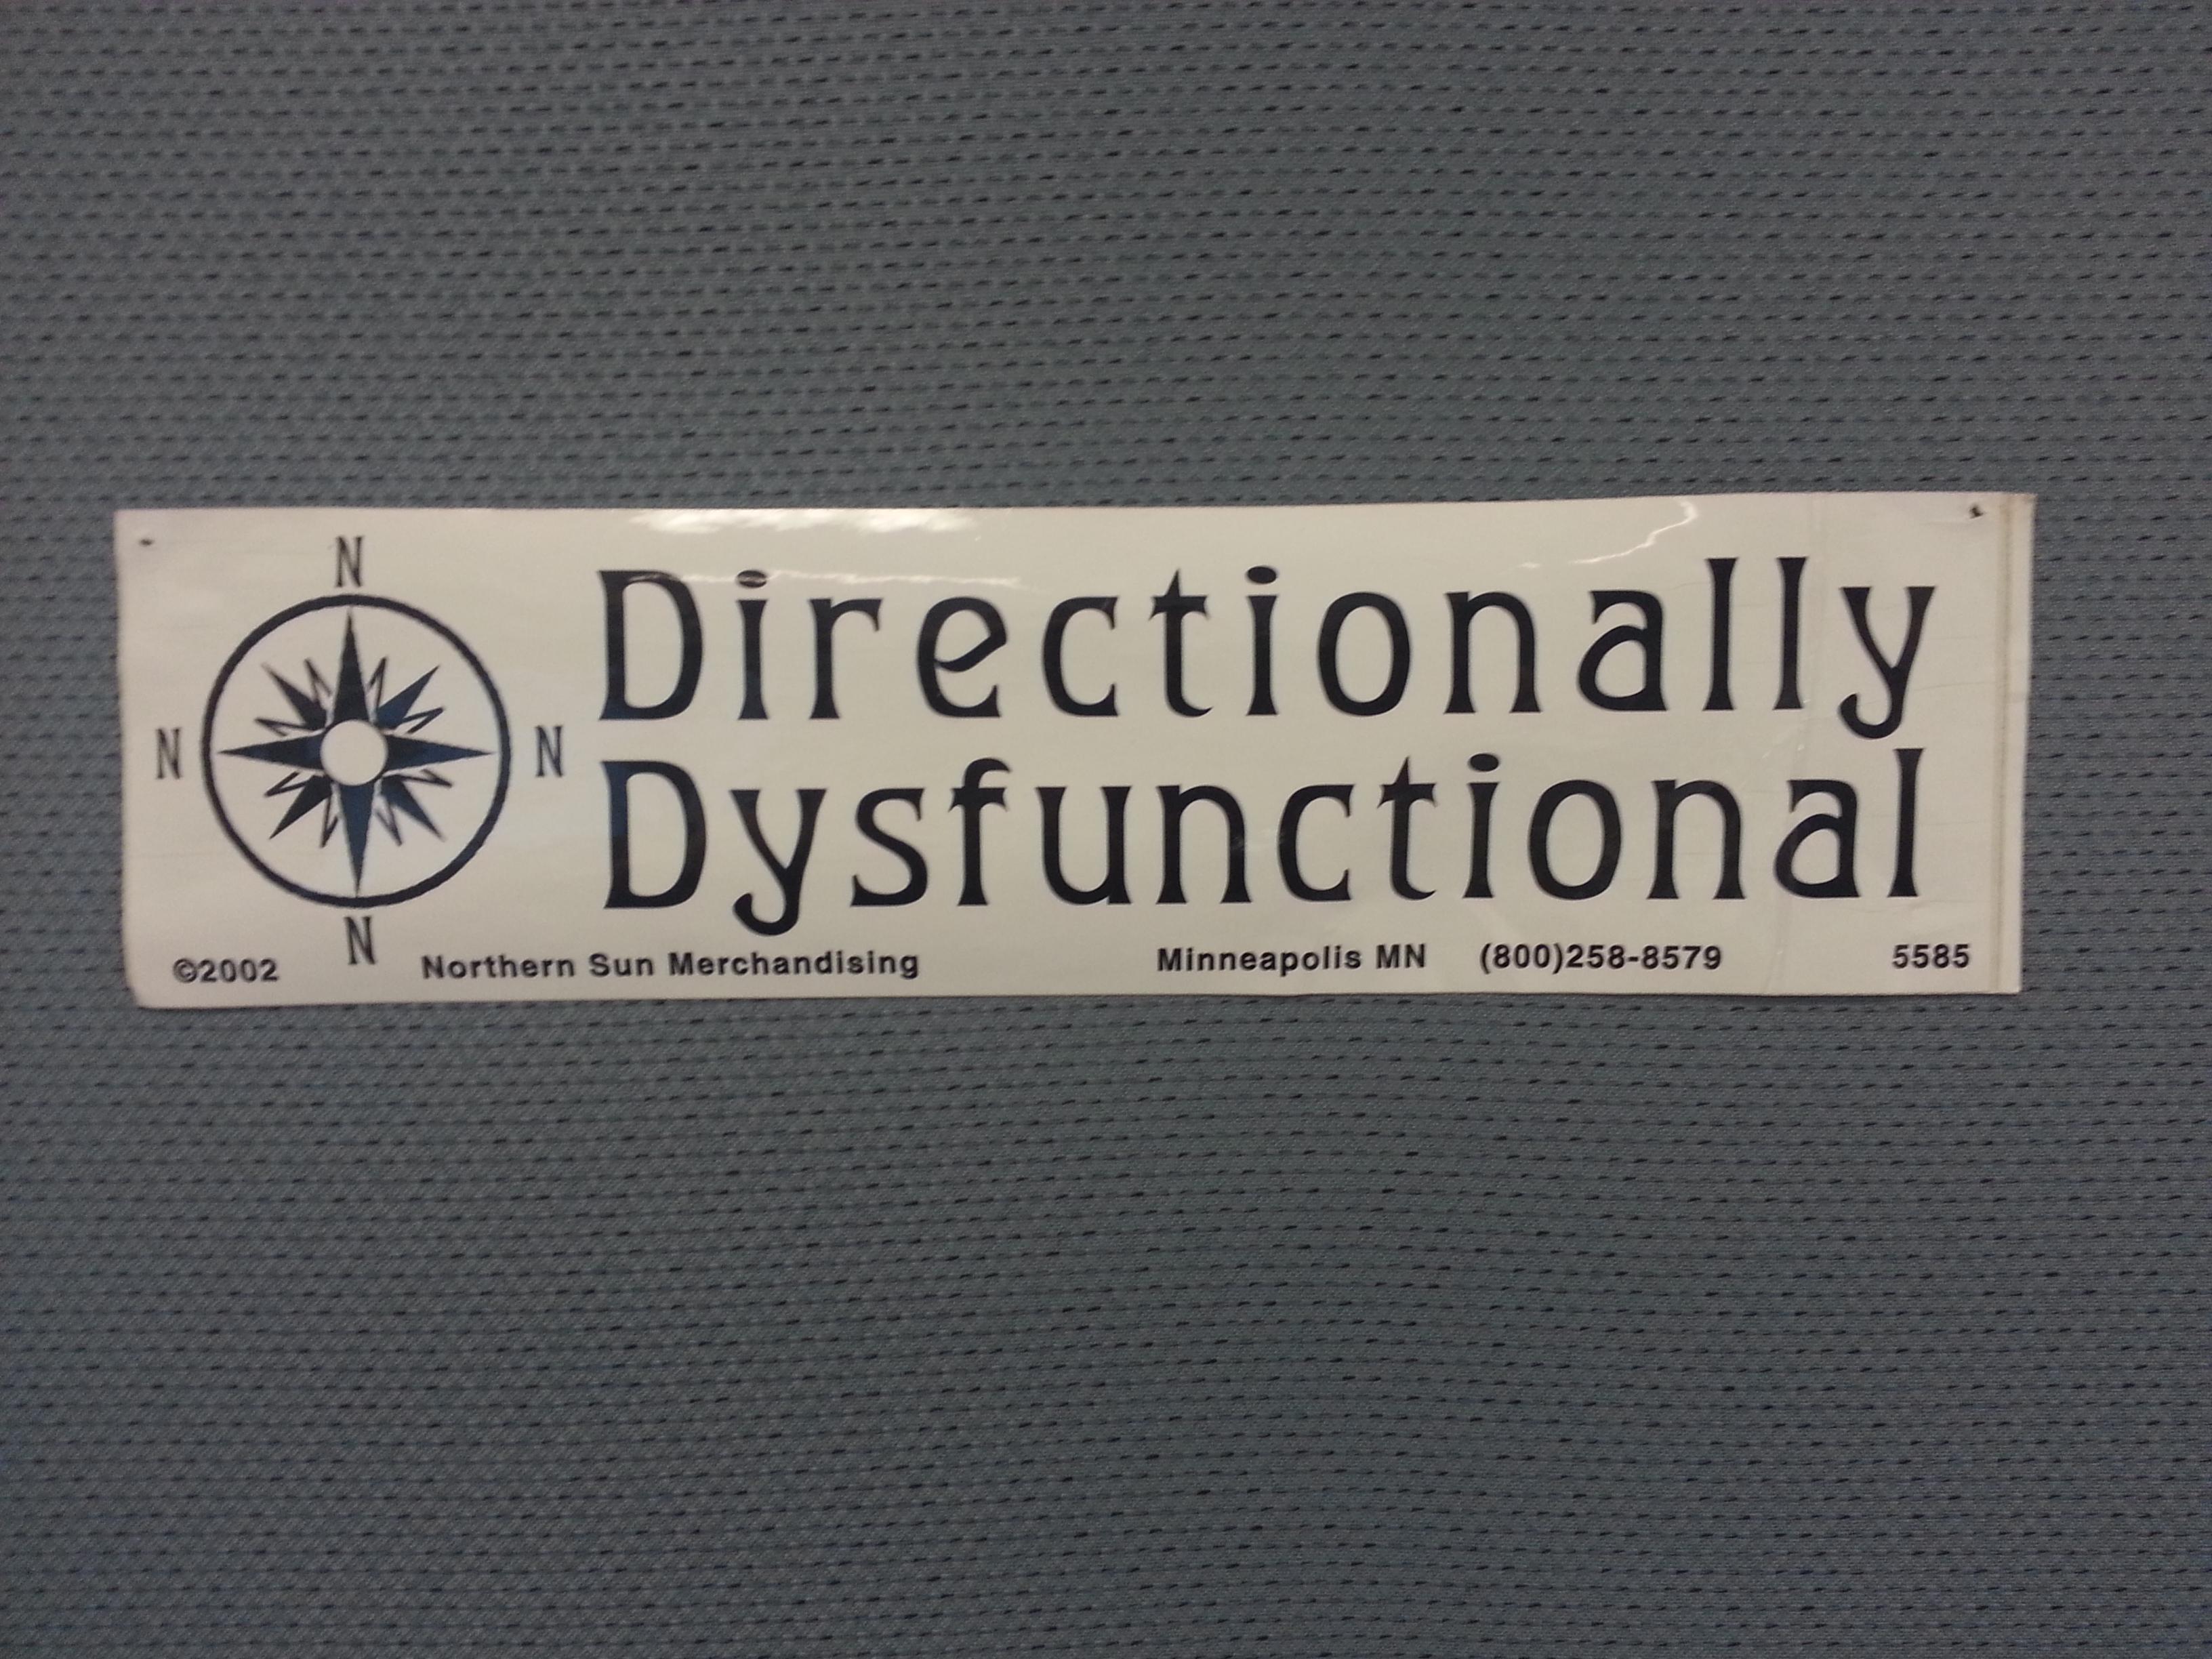 Directionally Dysfunctional